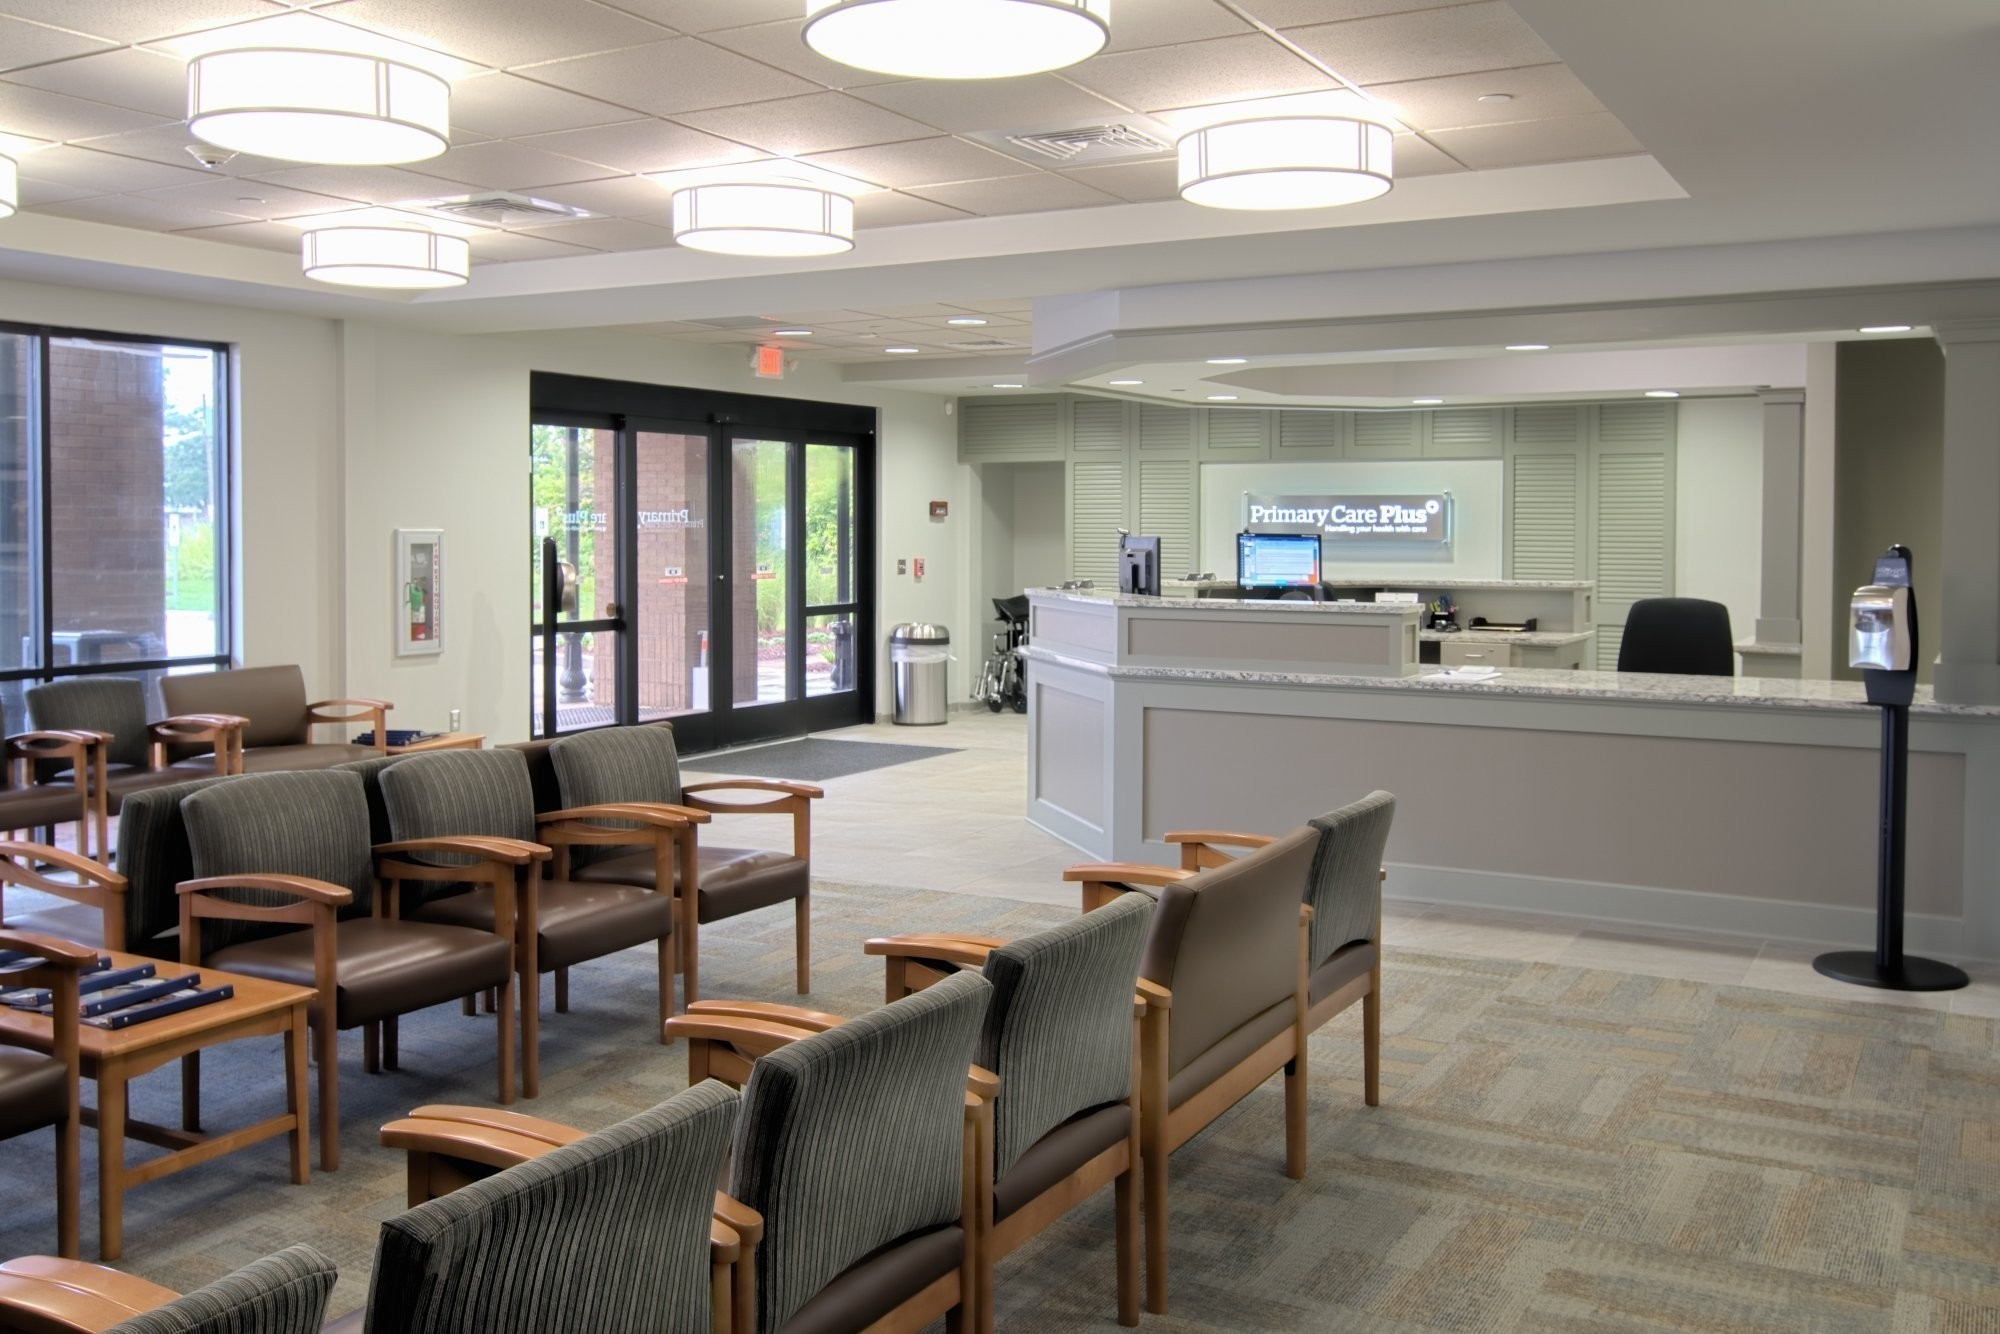 Primary Care Plus Clinic Baton Rouge   Portfolio   Rozas Ward